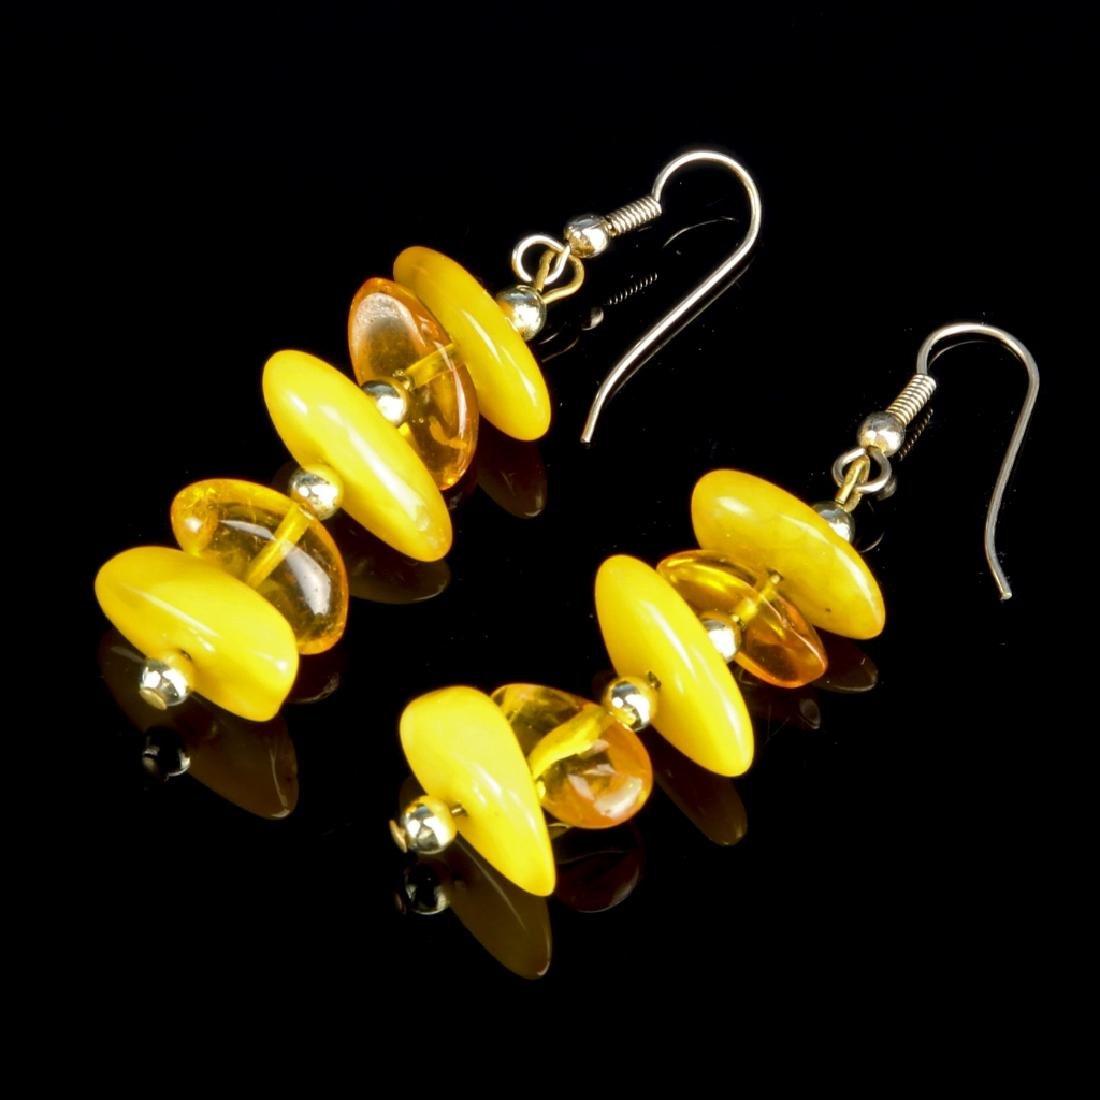 Pair of Chinese Amber Earrings